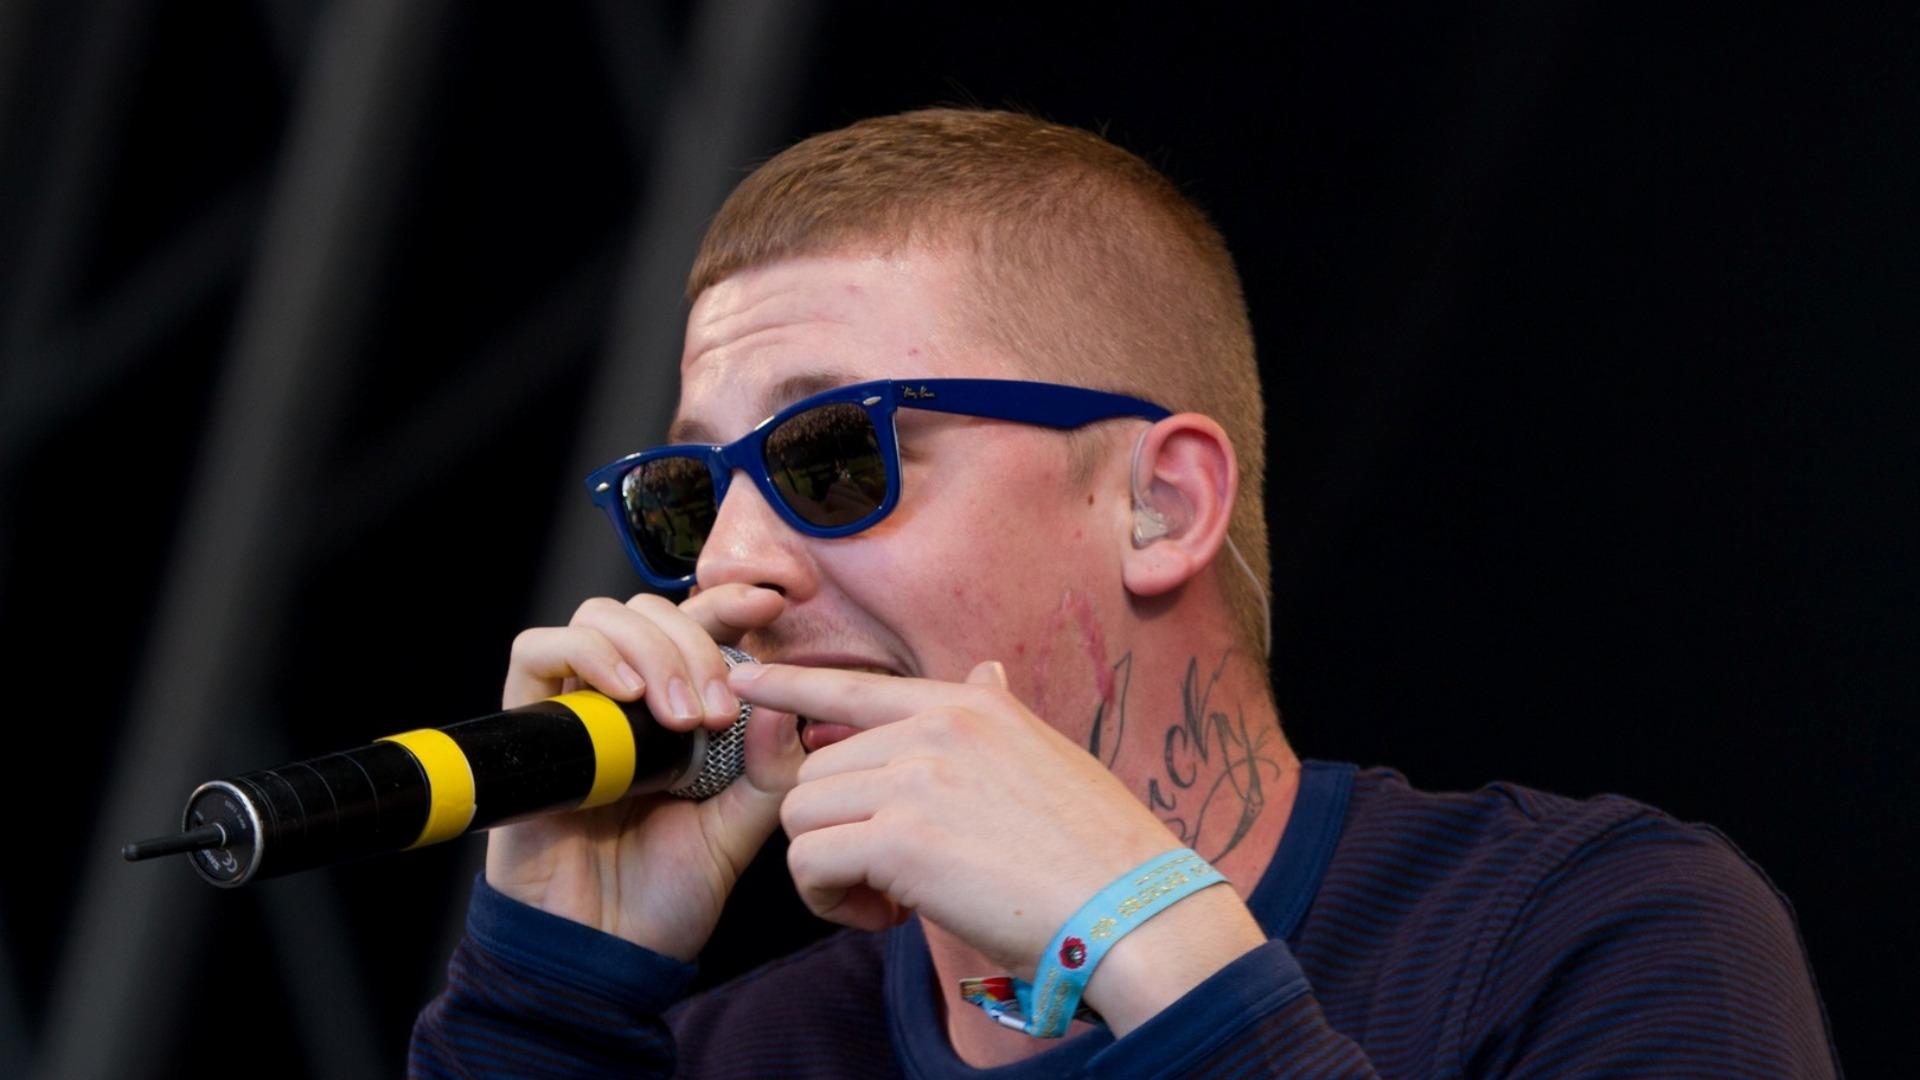 Professor Green Glasses Microphone